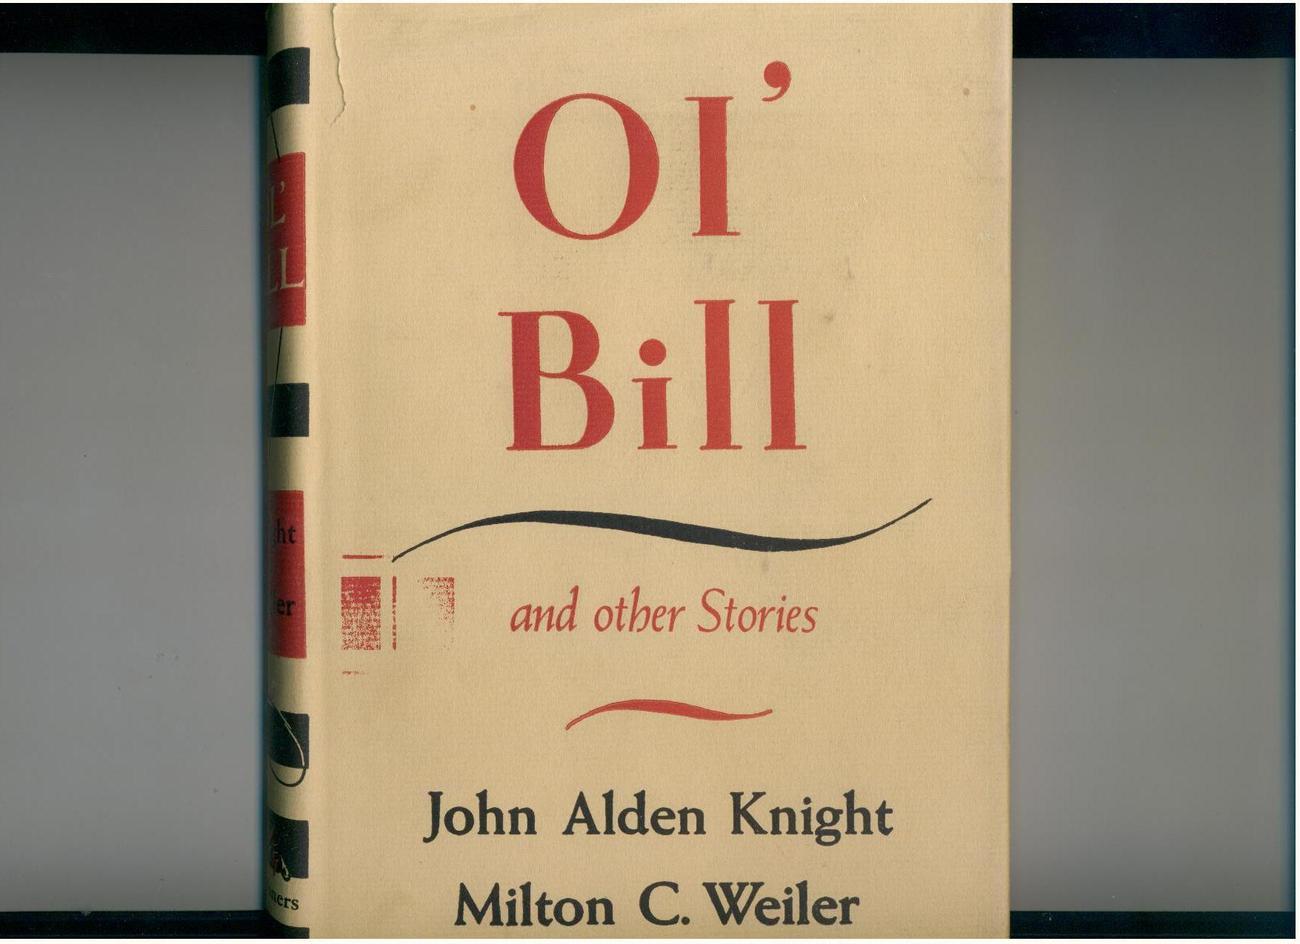 Knight-OL' BILL-1942-hunting/fishing-signed limited 1st ed.